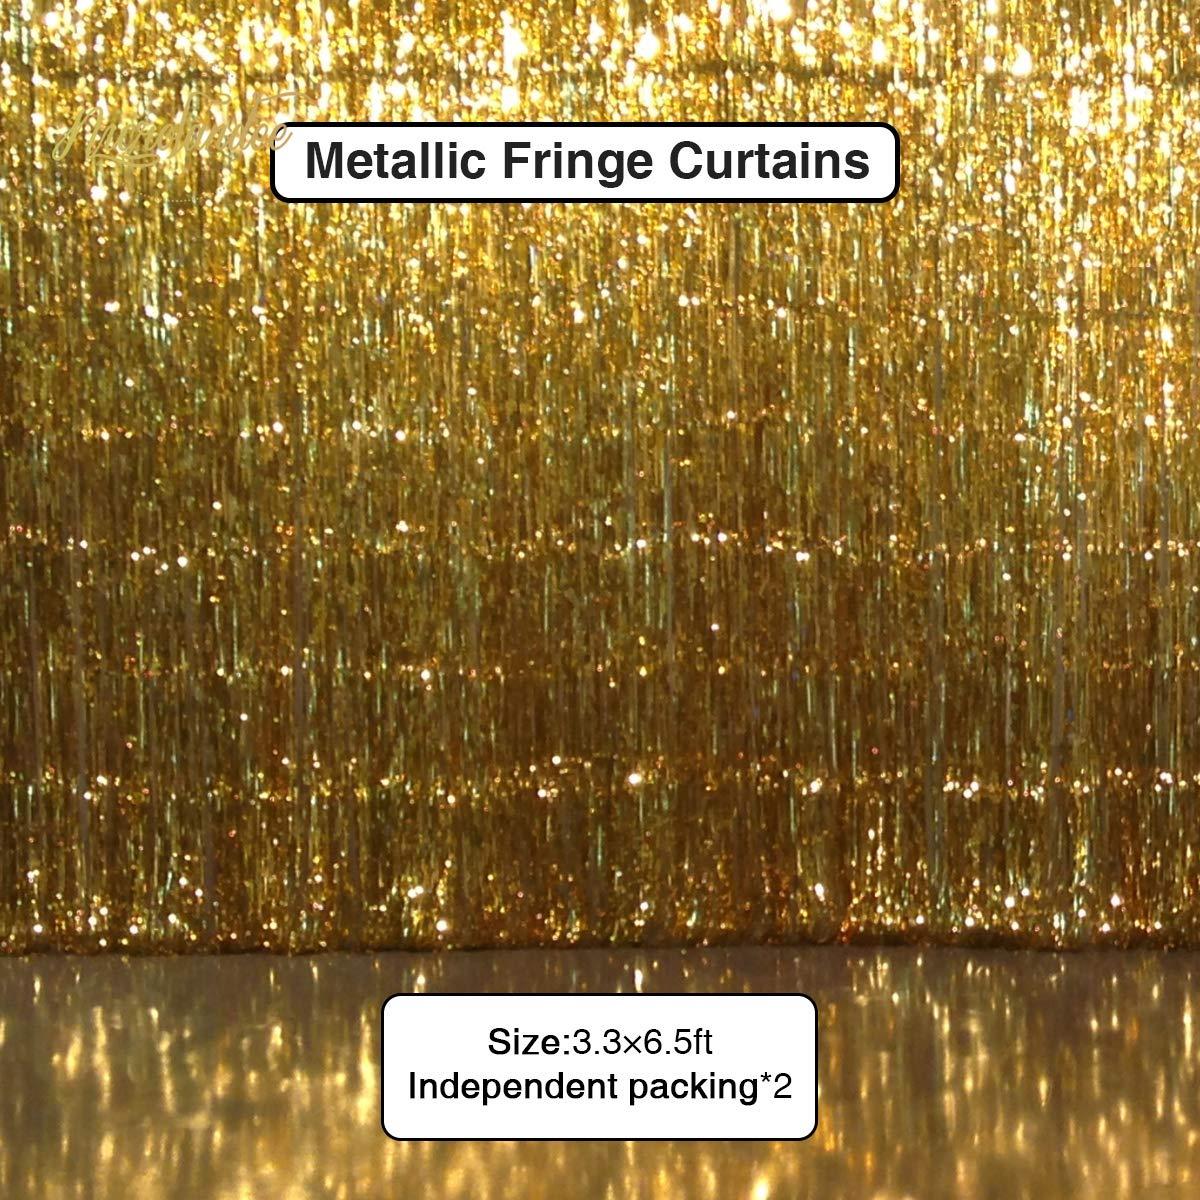 NICROLANDEE Black Gold Metallic Glitter Paper Lantern Decorations with Gold Foil Metallic Fringe Curtains for Graduation Wedding Bridal Shower Hen Bachelorette Birthday Anniversary Backdrop Decor by NICROLANDEE (Image #5)